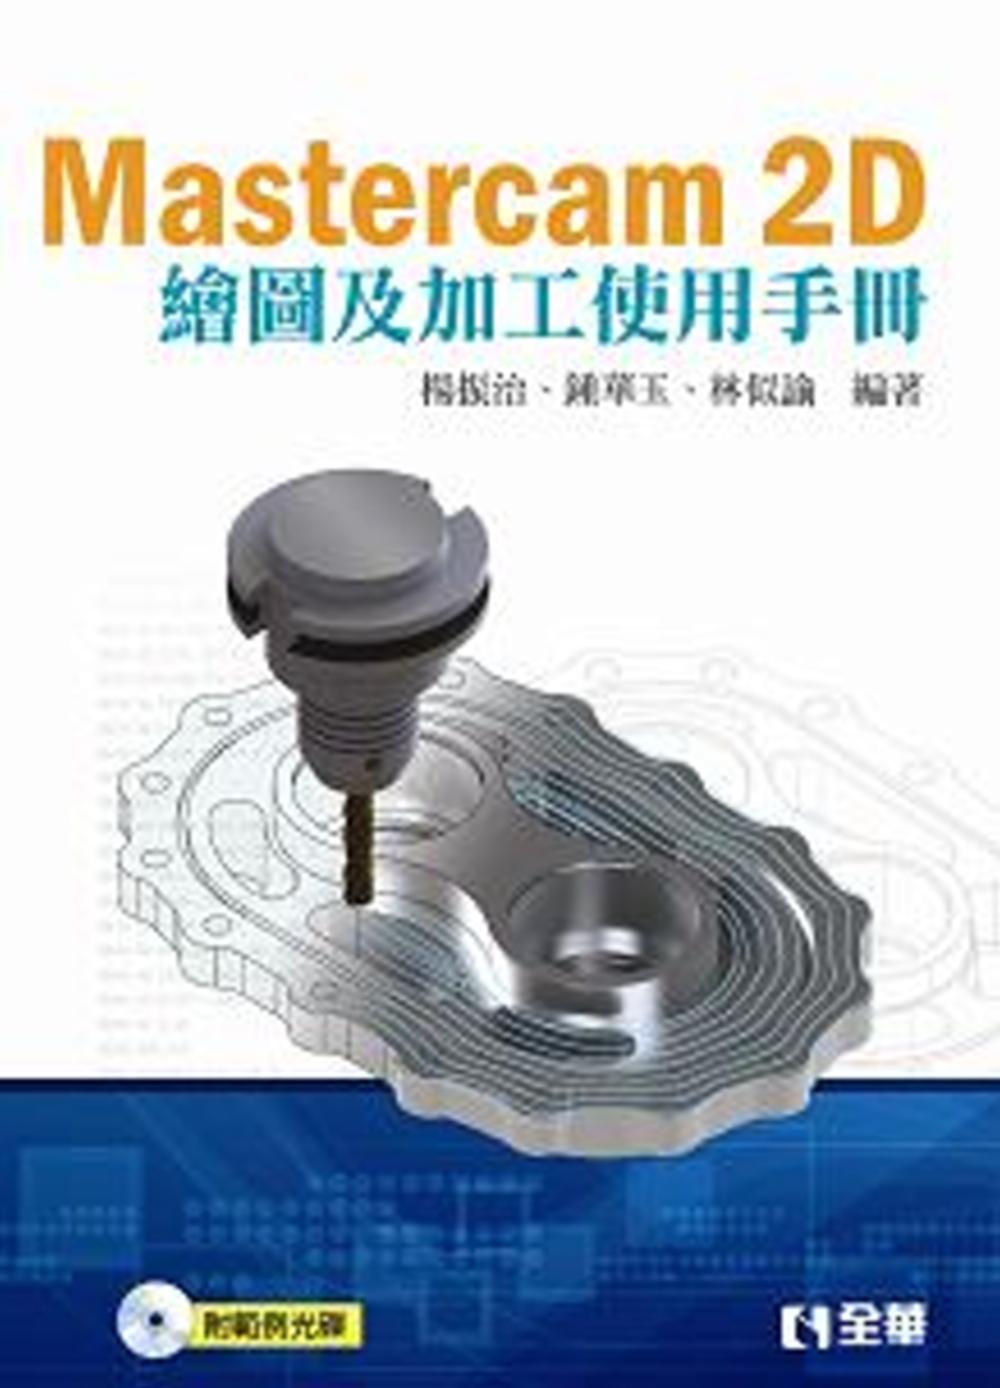 Mastercam 2D繪圖及加工使用手冊(附範例光碟)